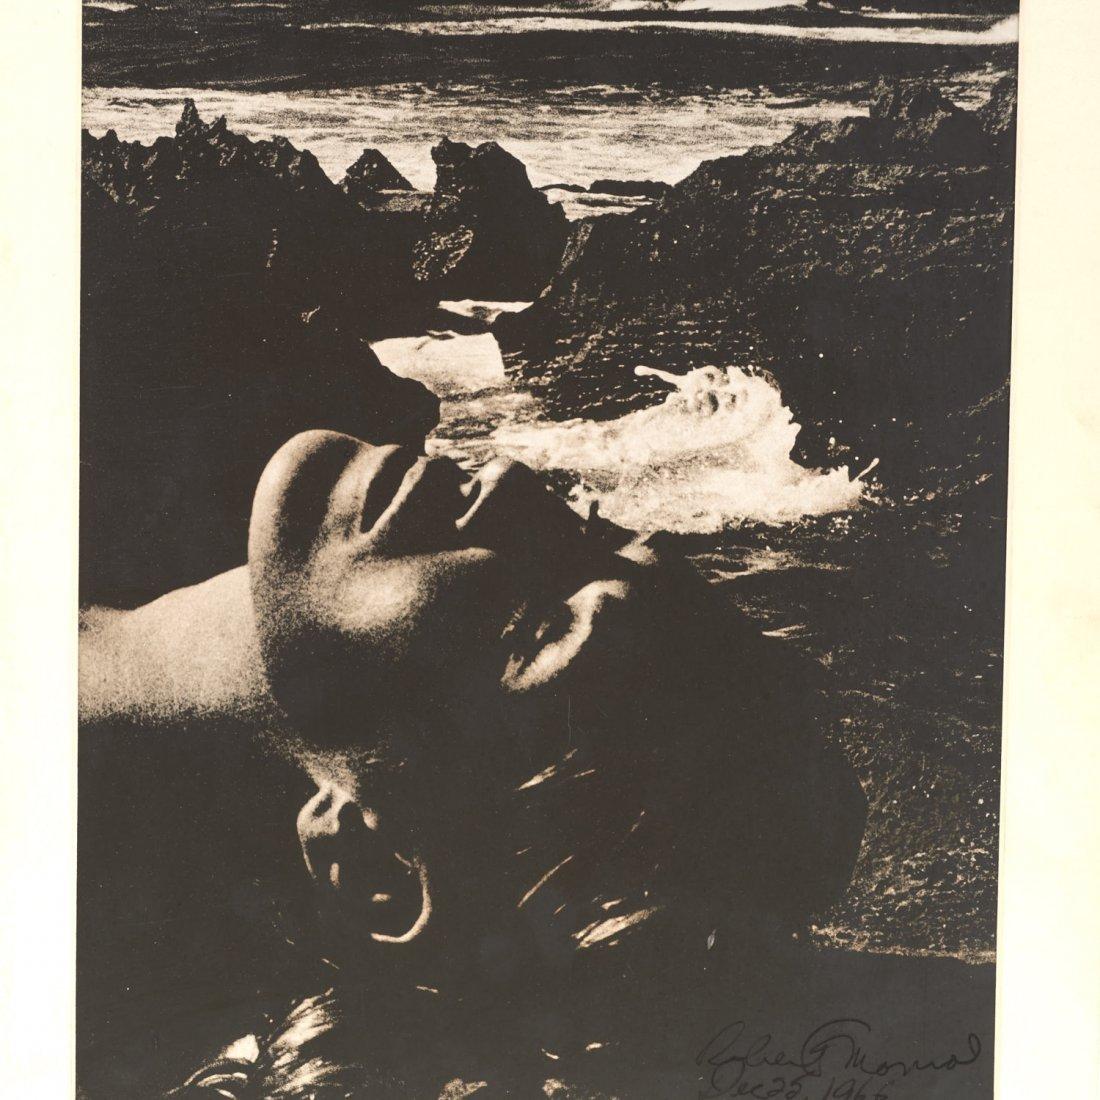 Robert Monroe, photograph - 2